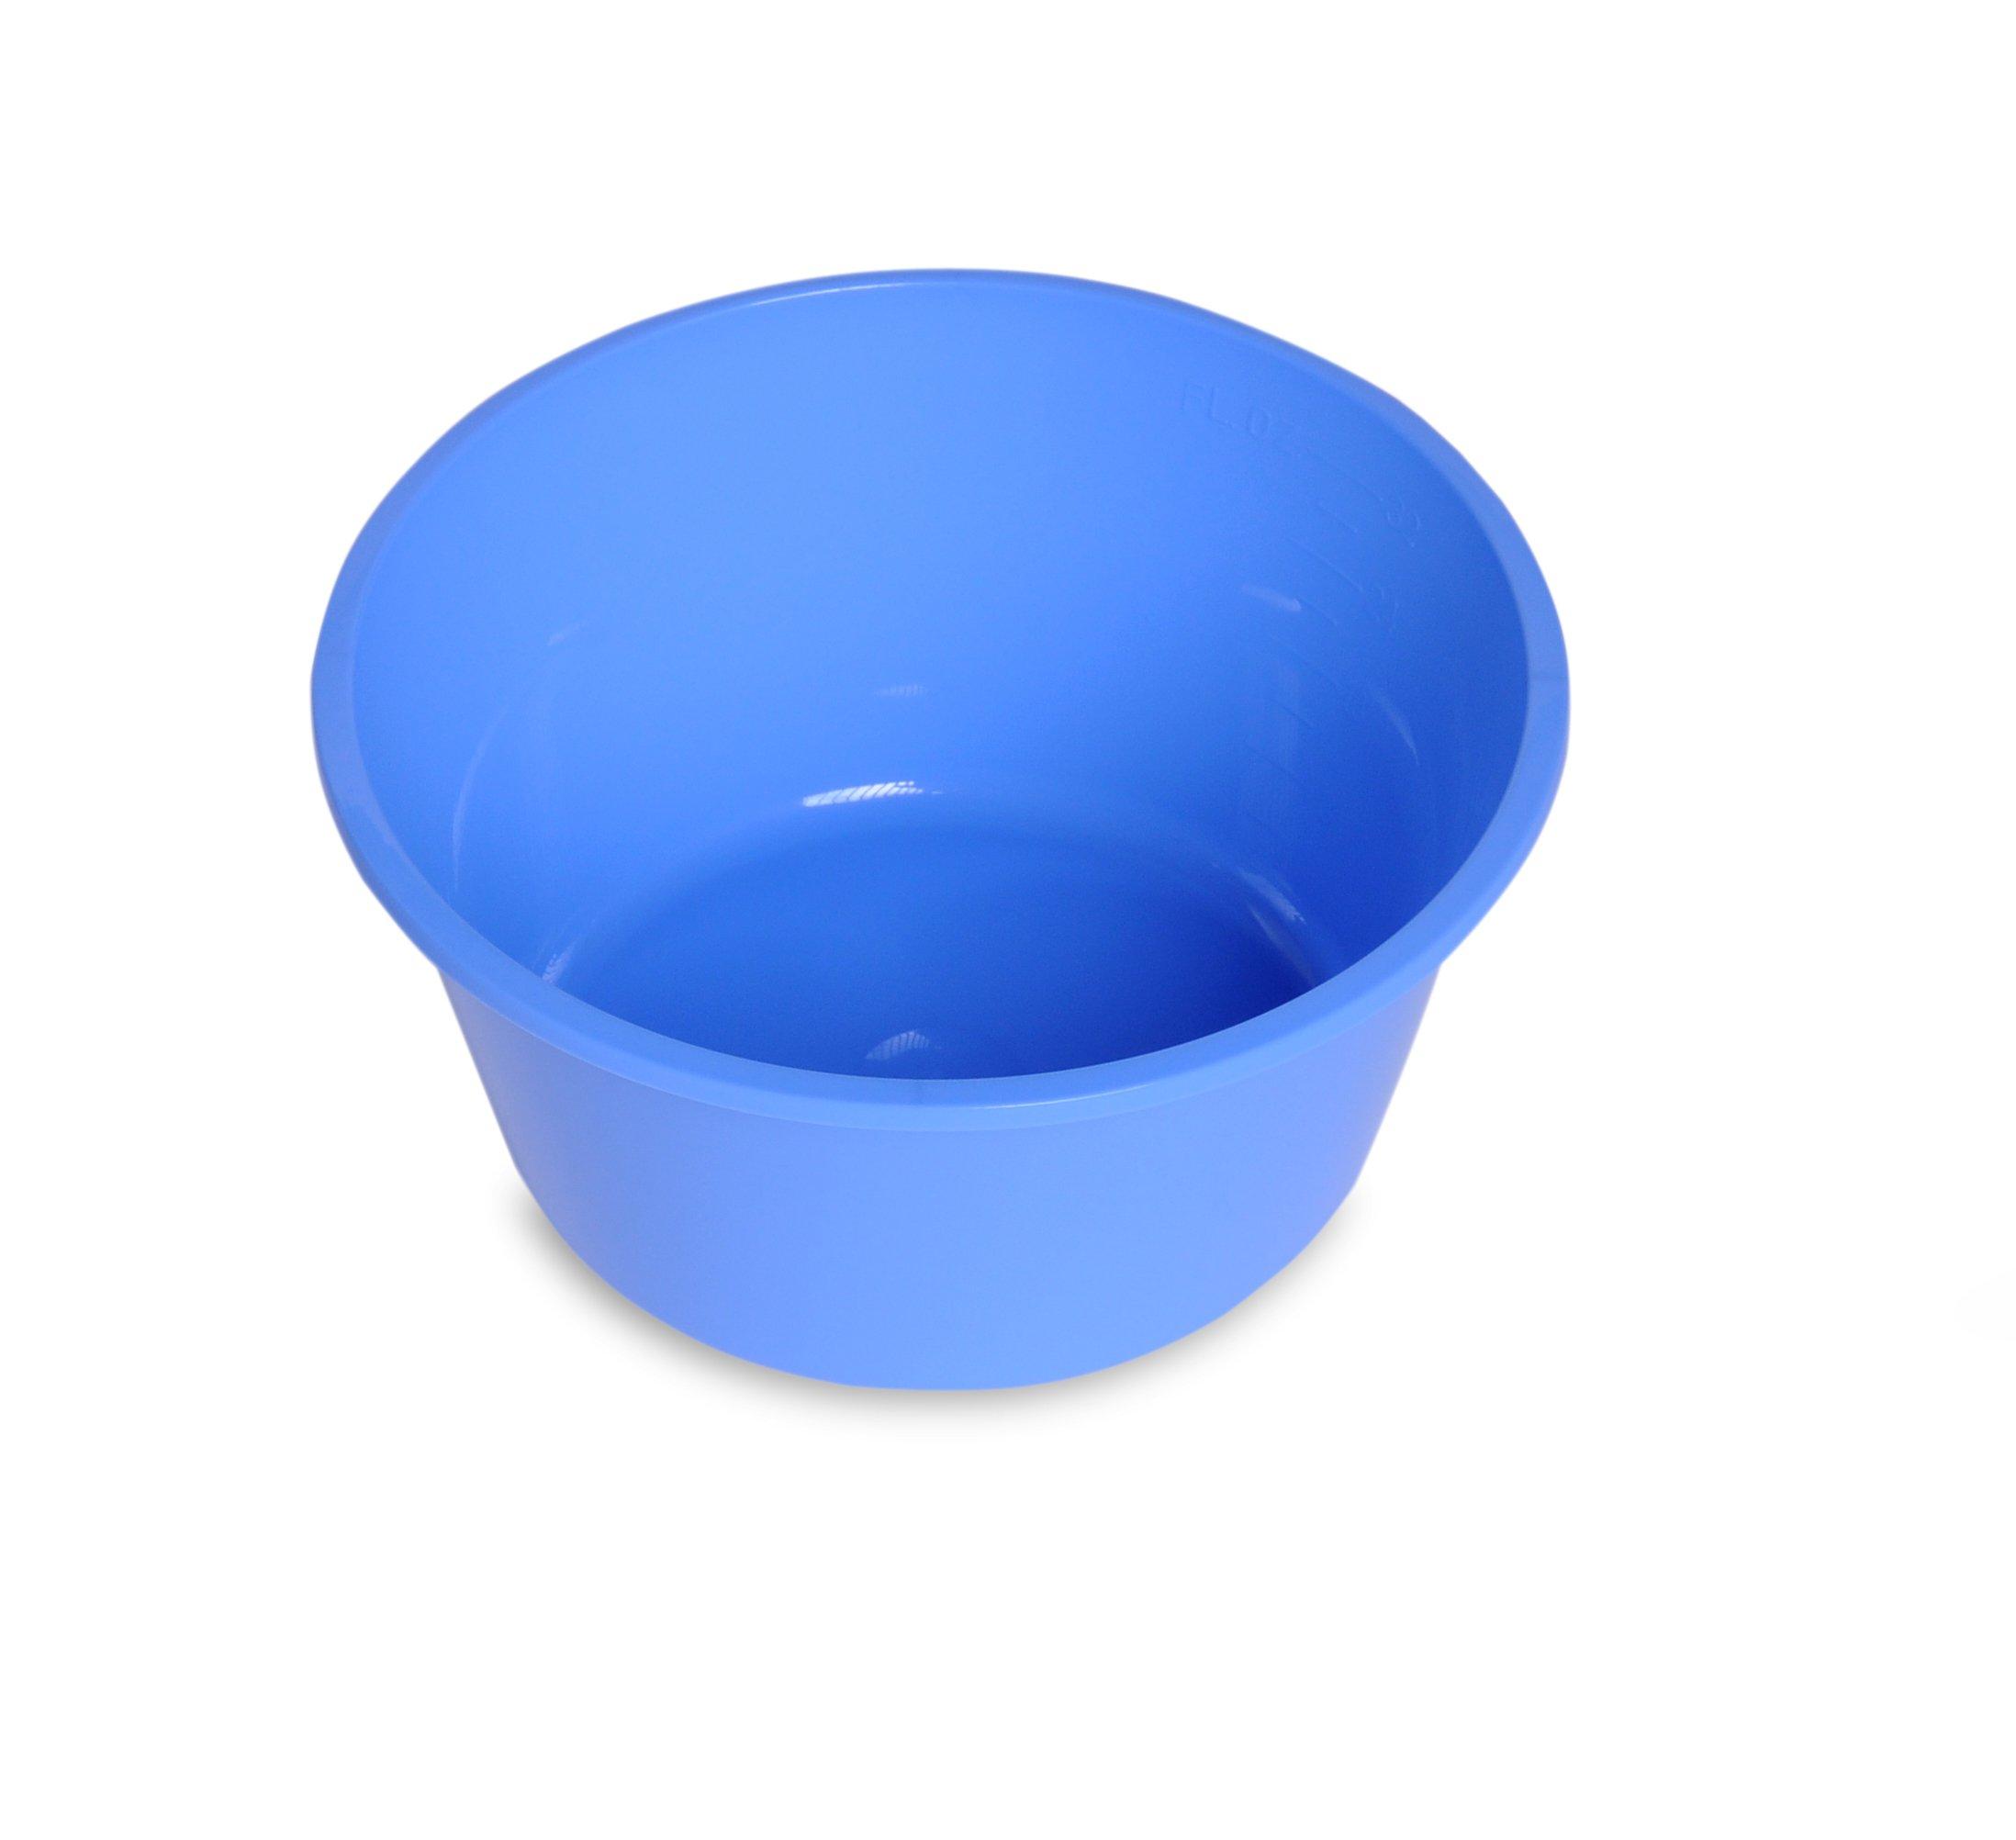 Medline DYND50350 Large Non-Sterile Plastic Bowls, 32 oz (Pack of 250)